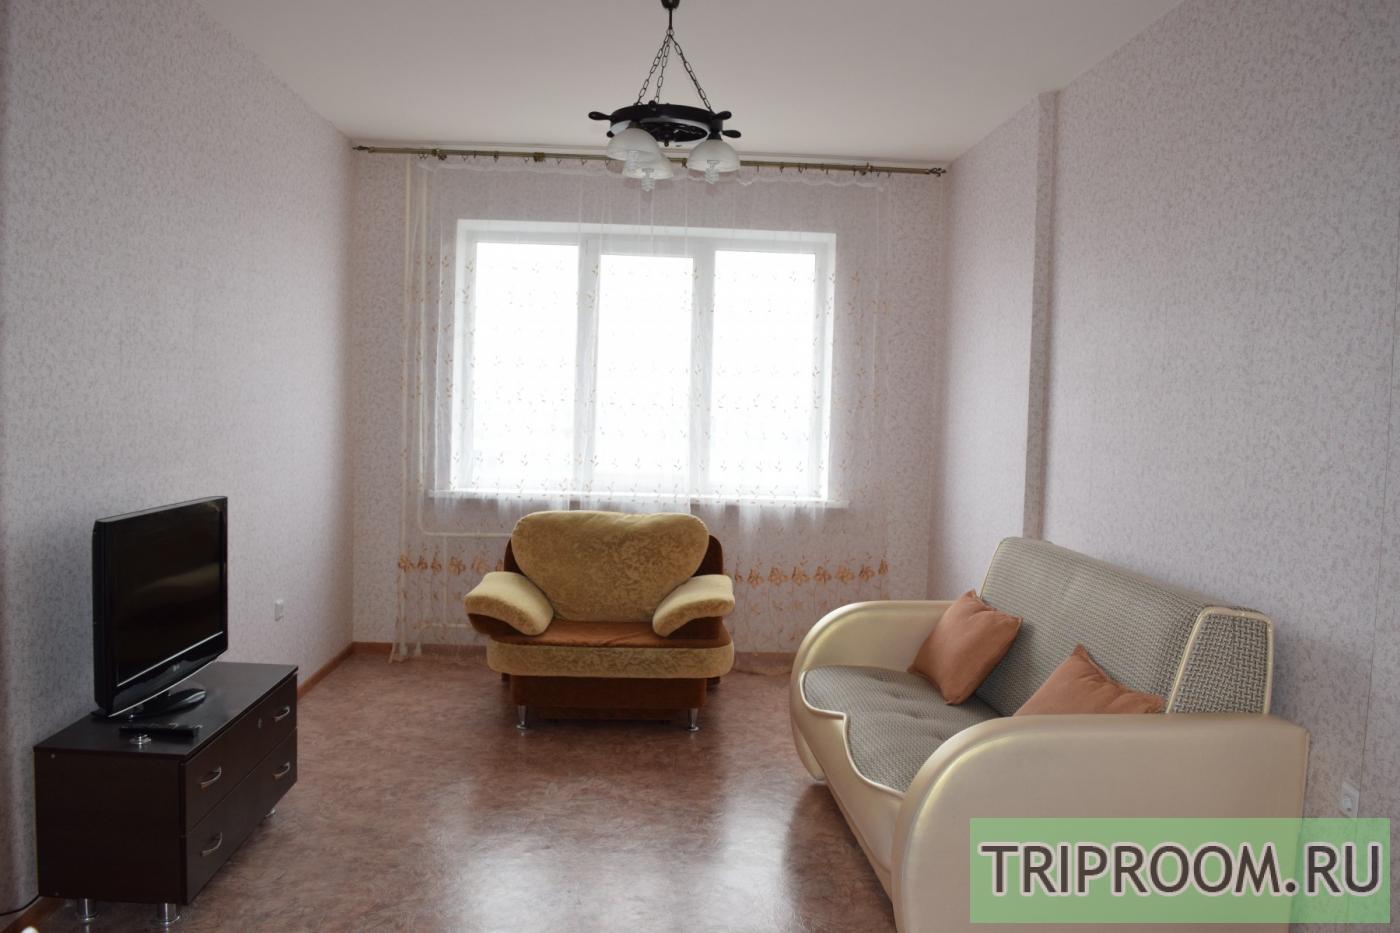 2-комнатная квартира посуточно (вариант № 13501), ул. Пеше-стрелецкая улица, фото № 3